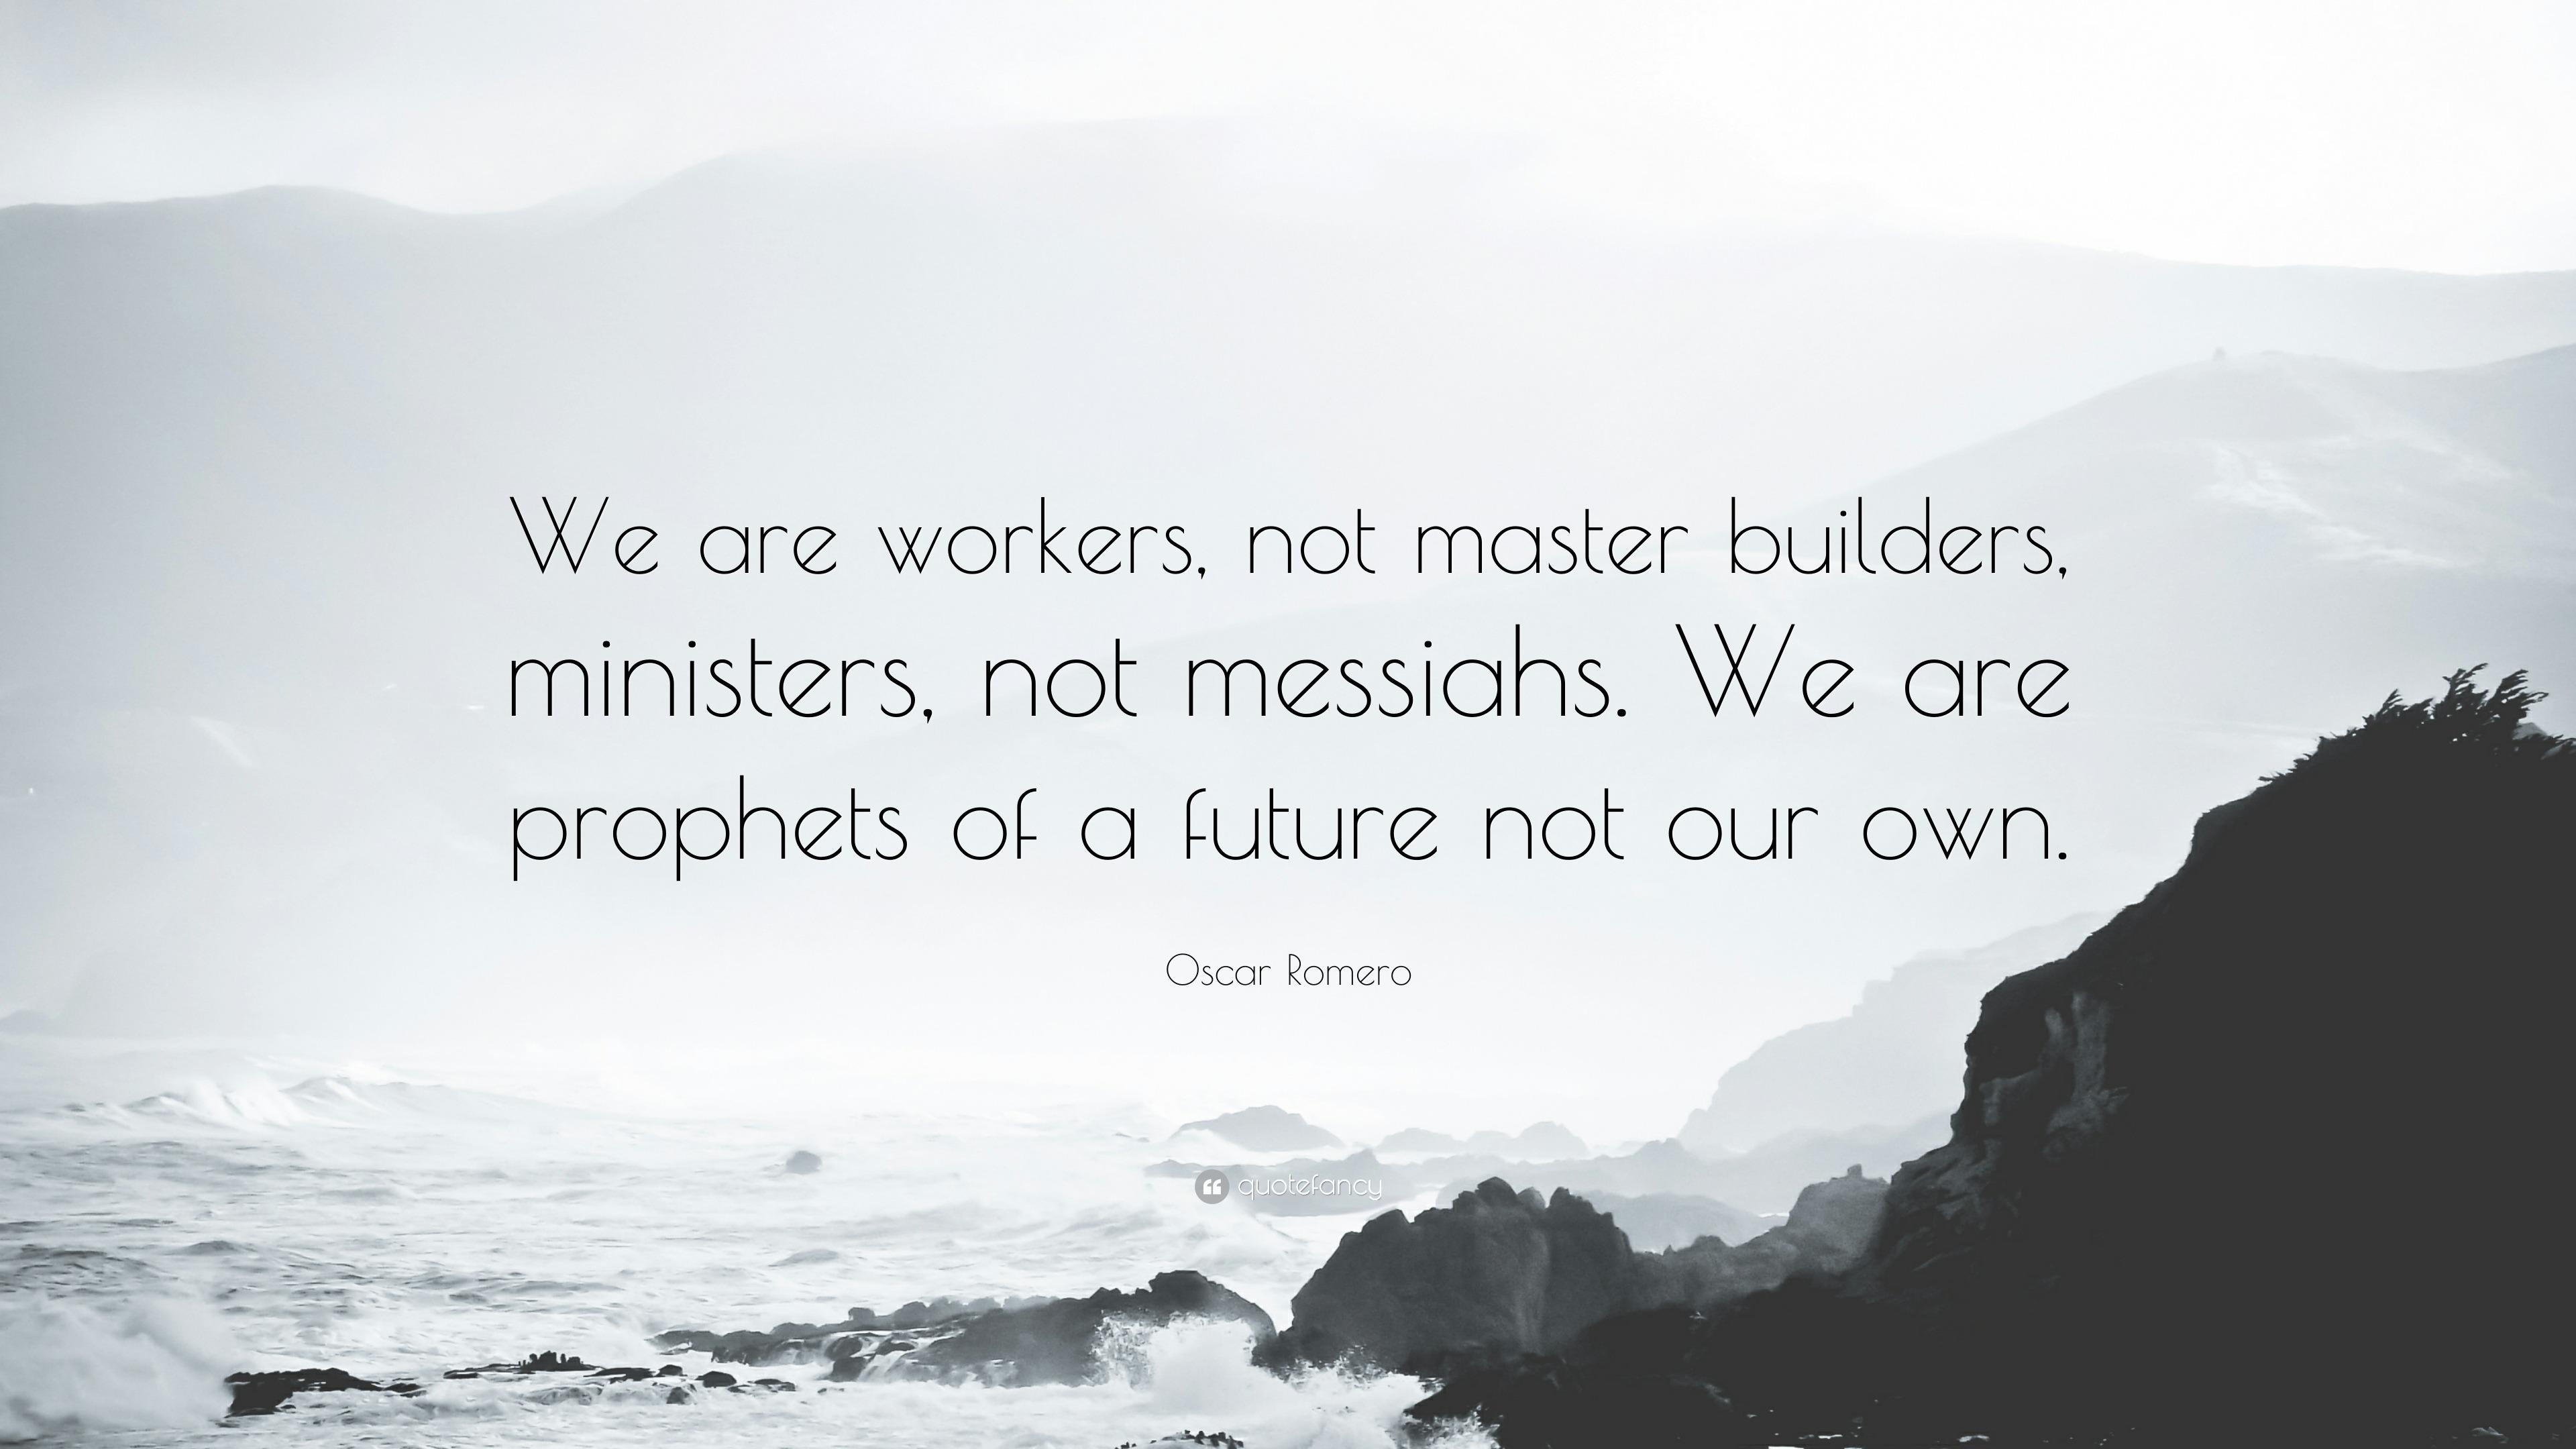 Oscar Romero Quotes (37 wallpapers) - Quotefancy